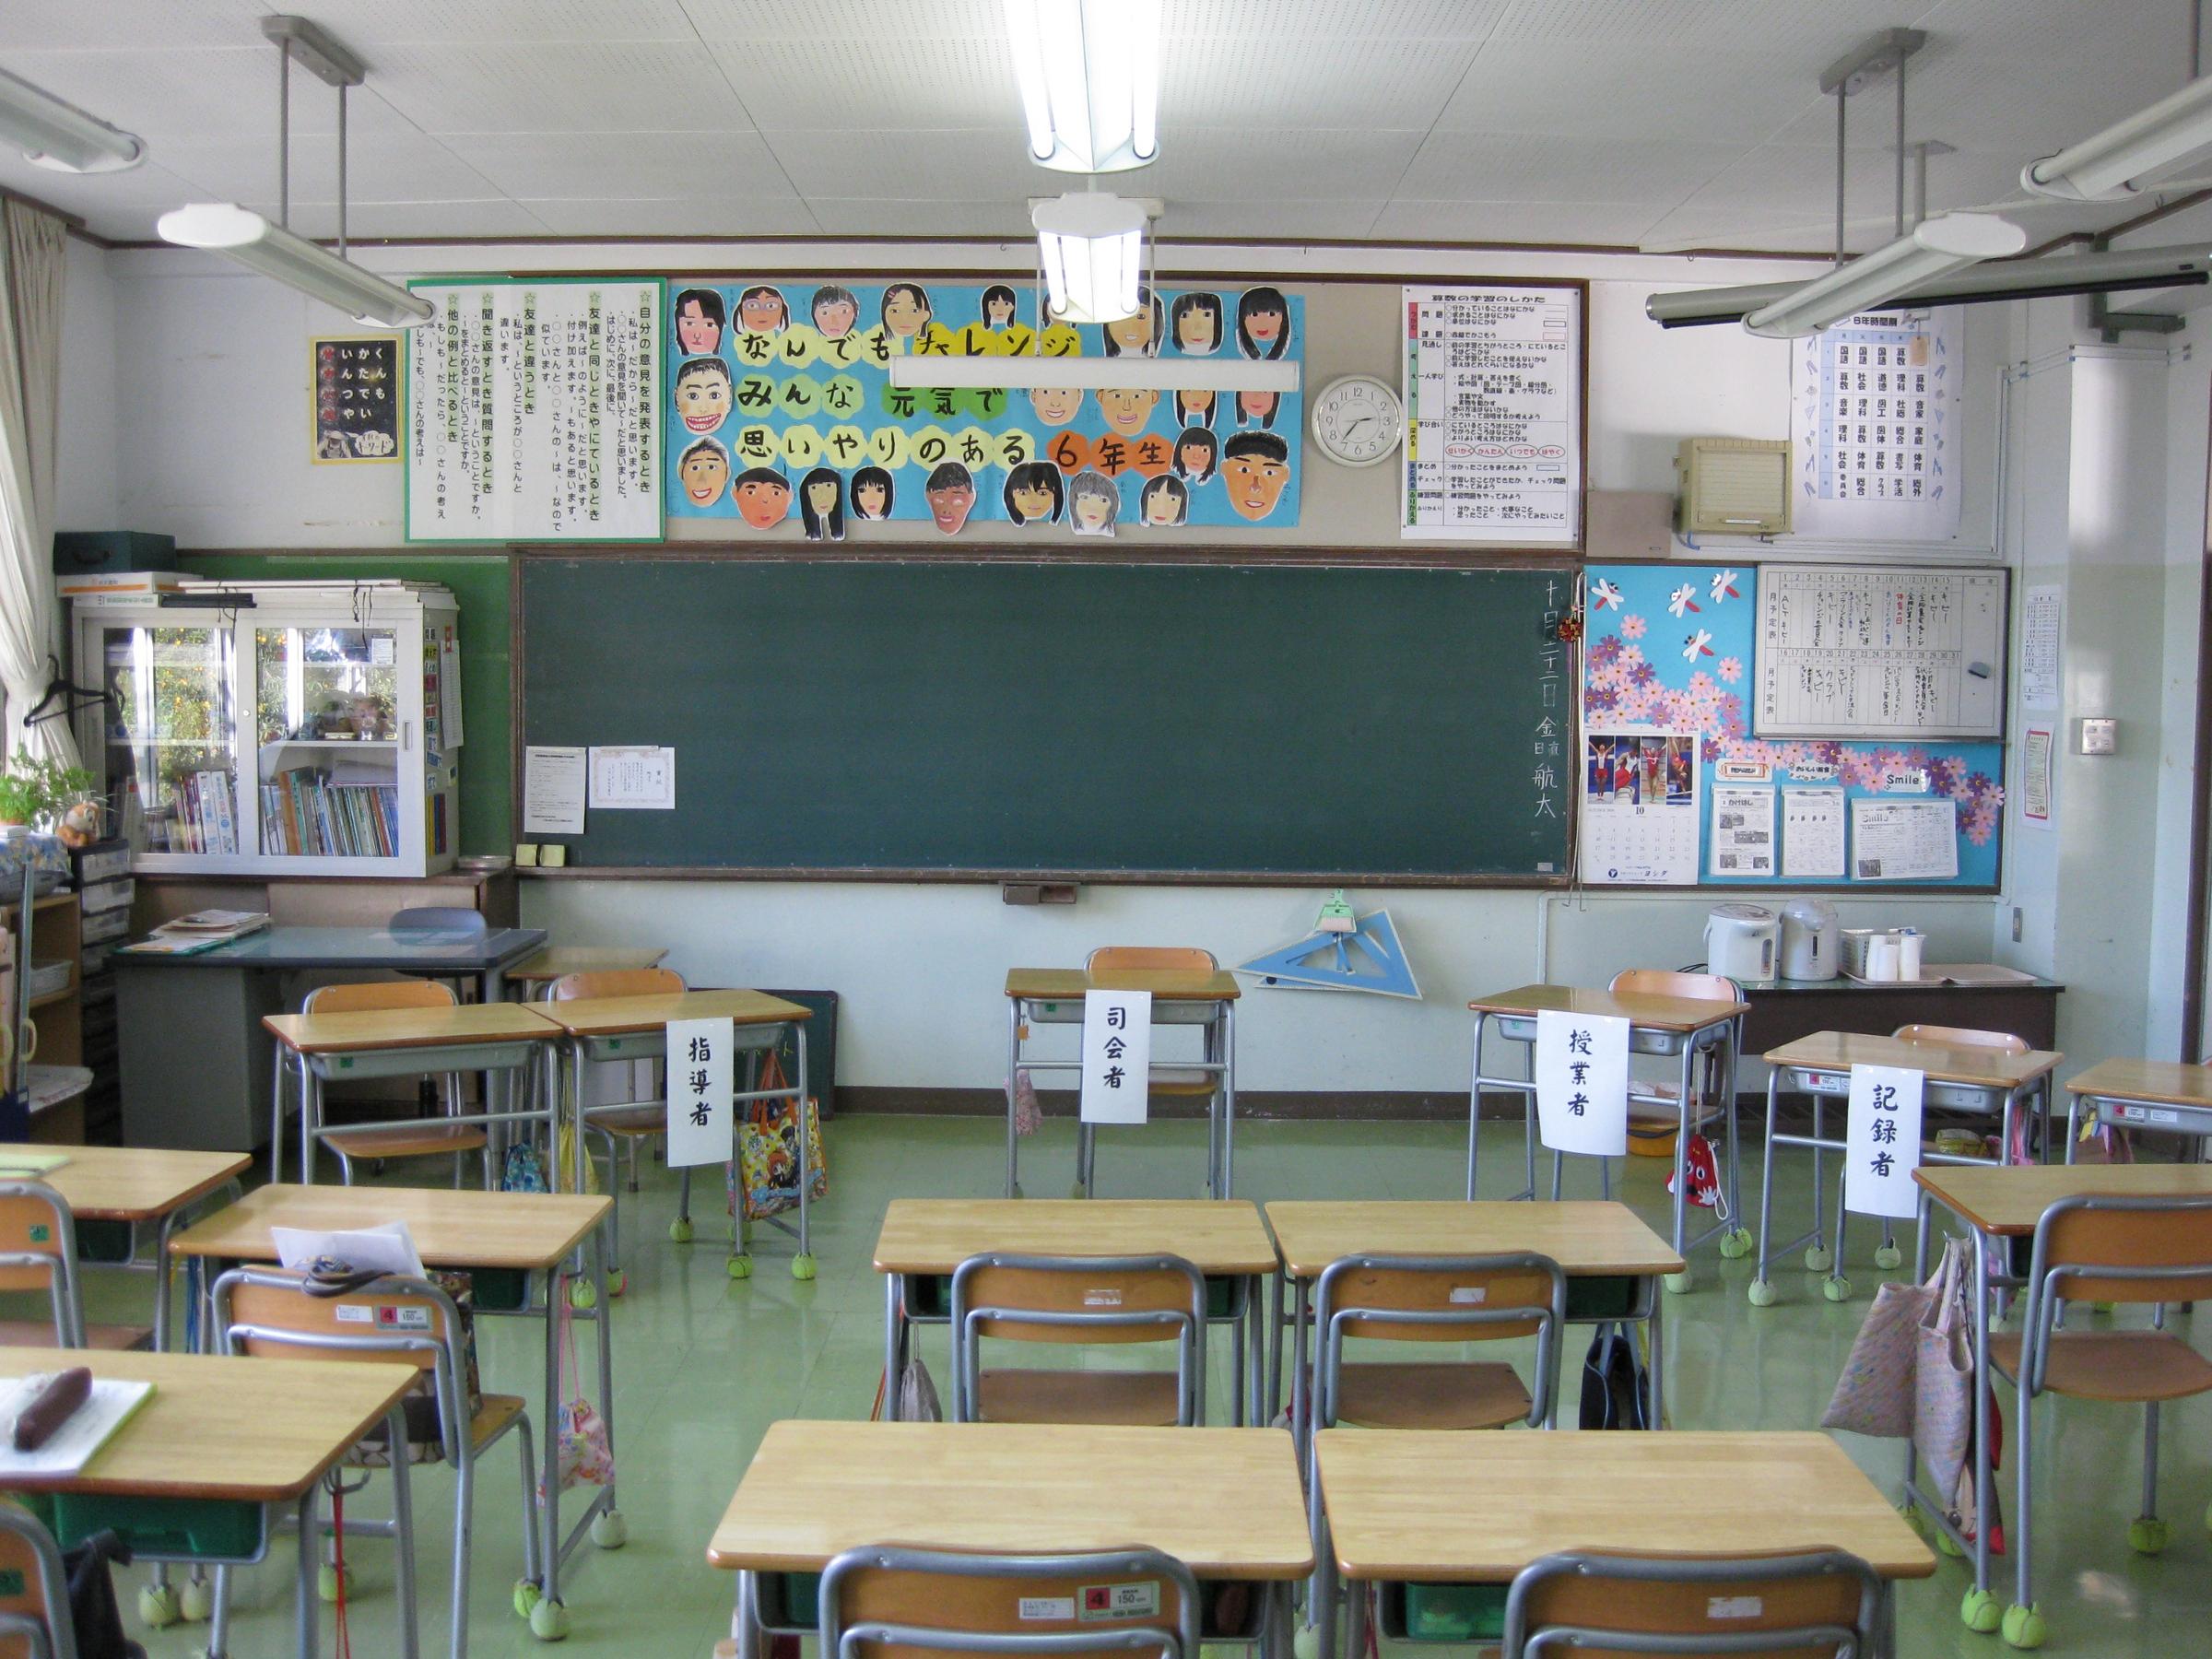 Classroom Decor For 6th Grade ~ File kawauchi es th grade classroom g wikimedia commons